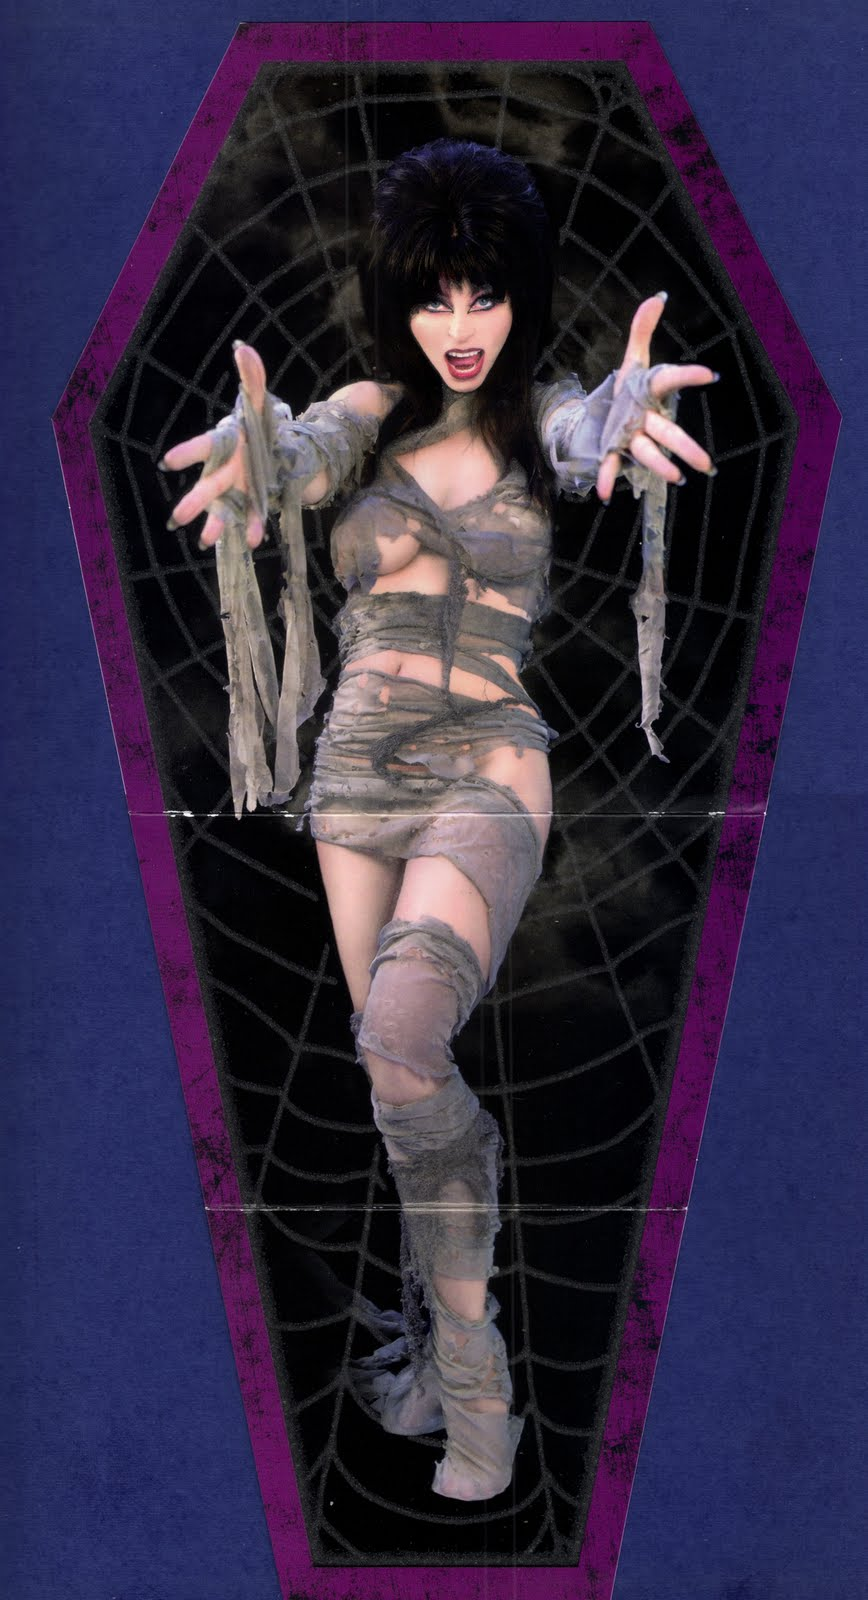 Elvira The Mistress Of The Dark Cult Oddities